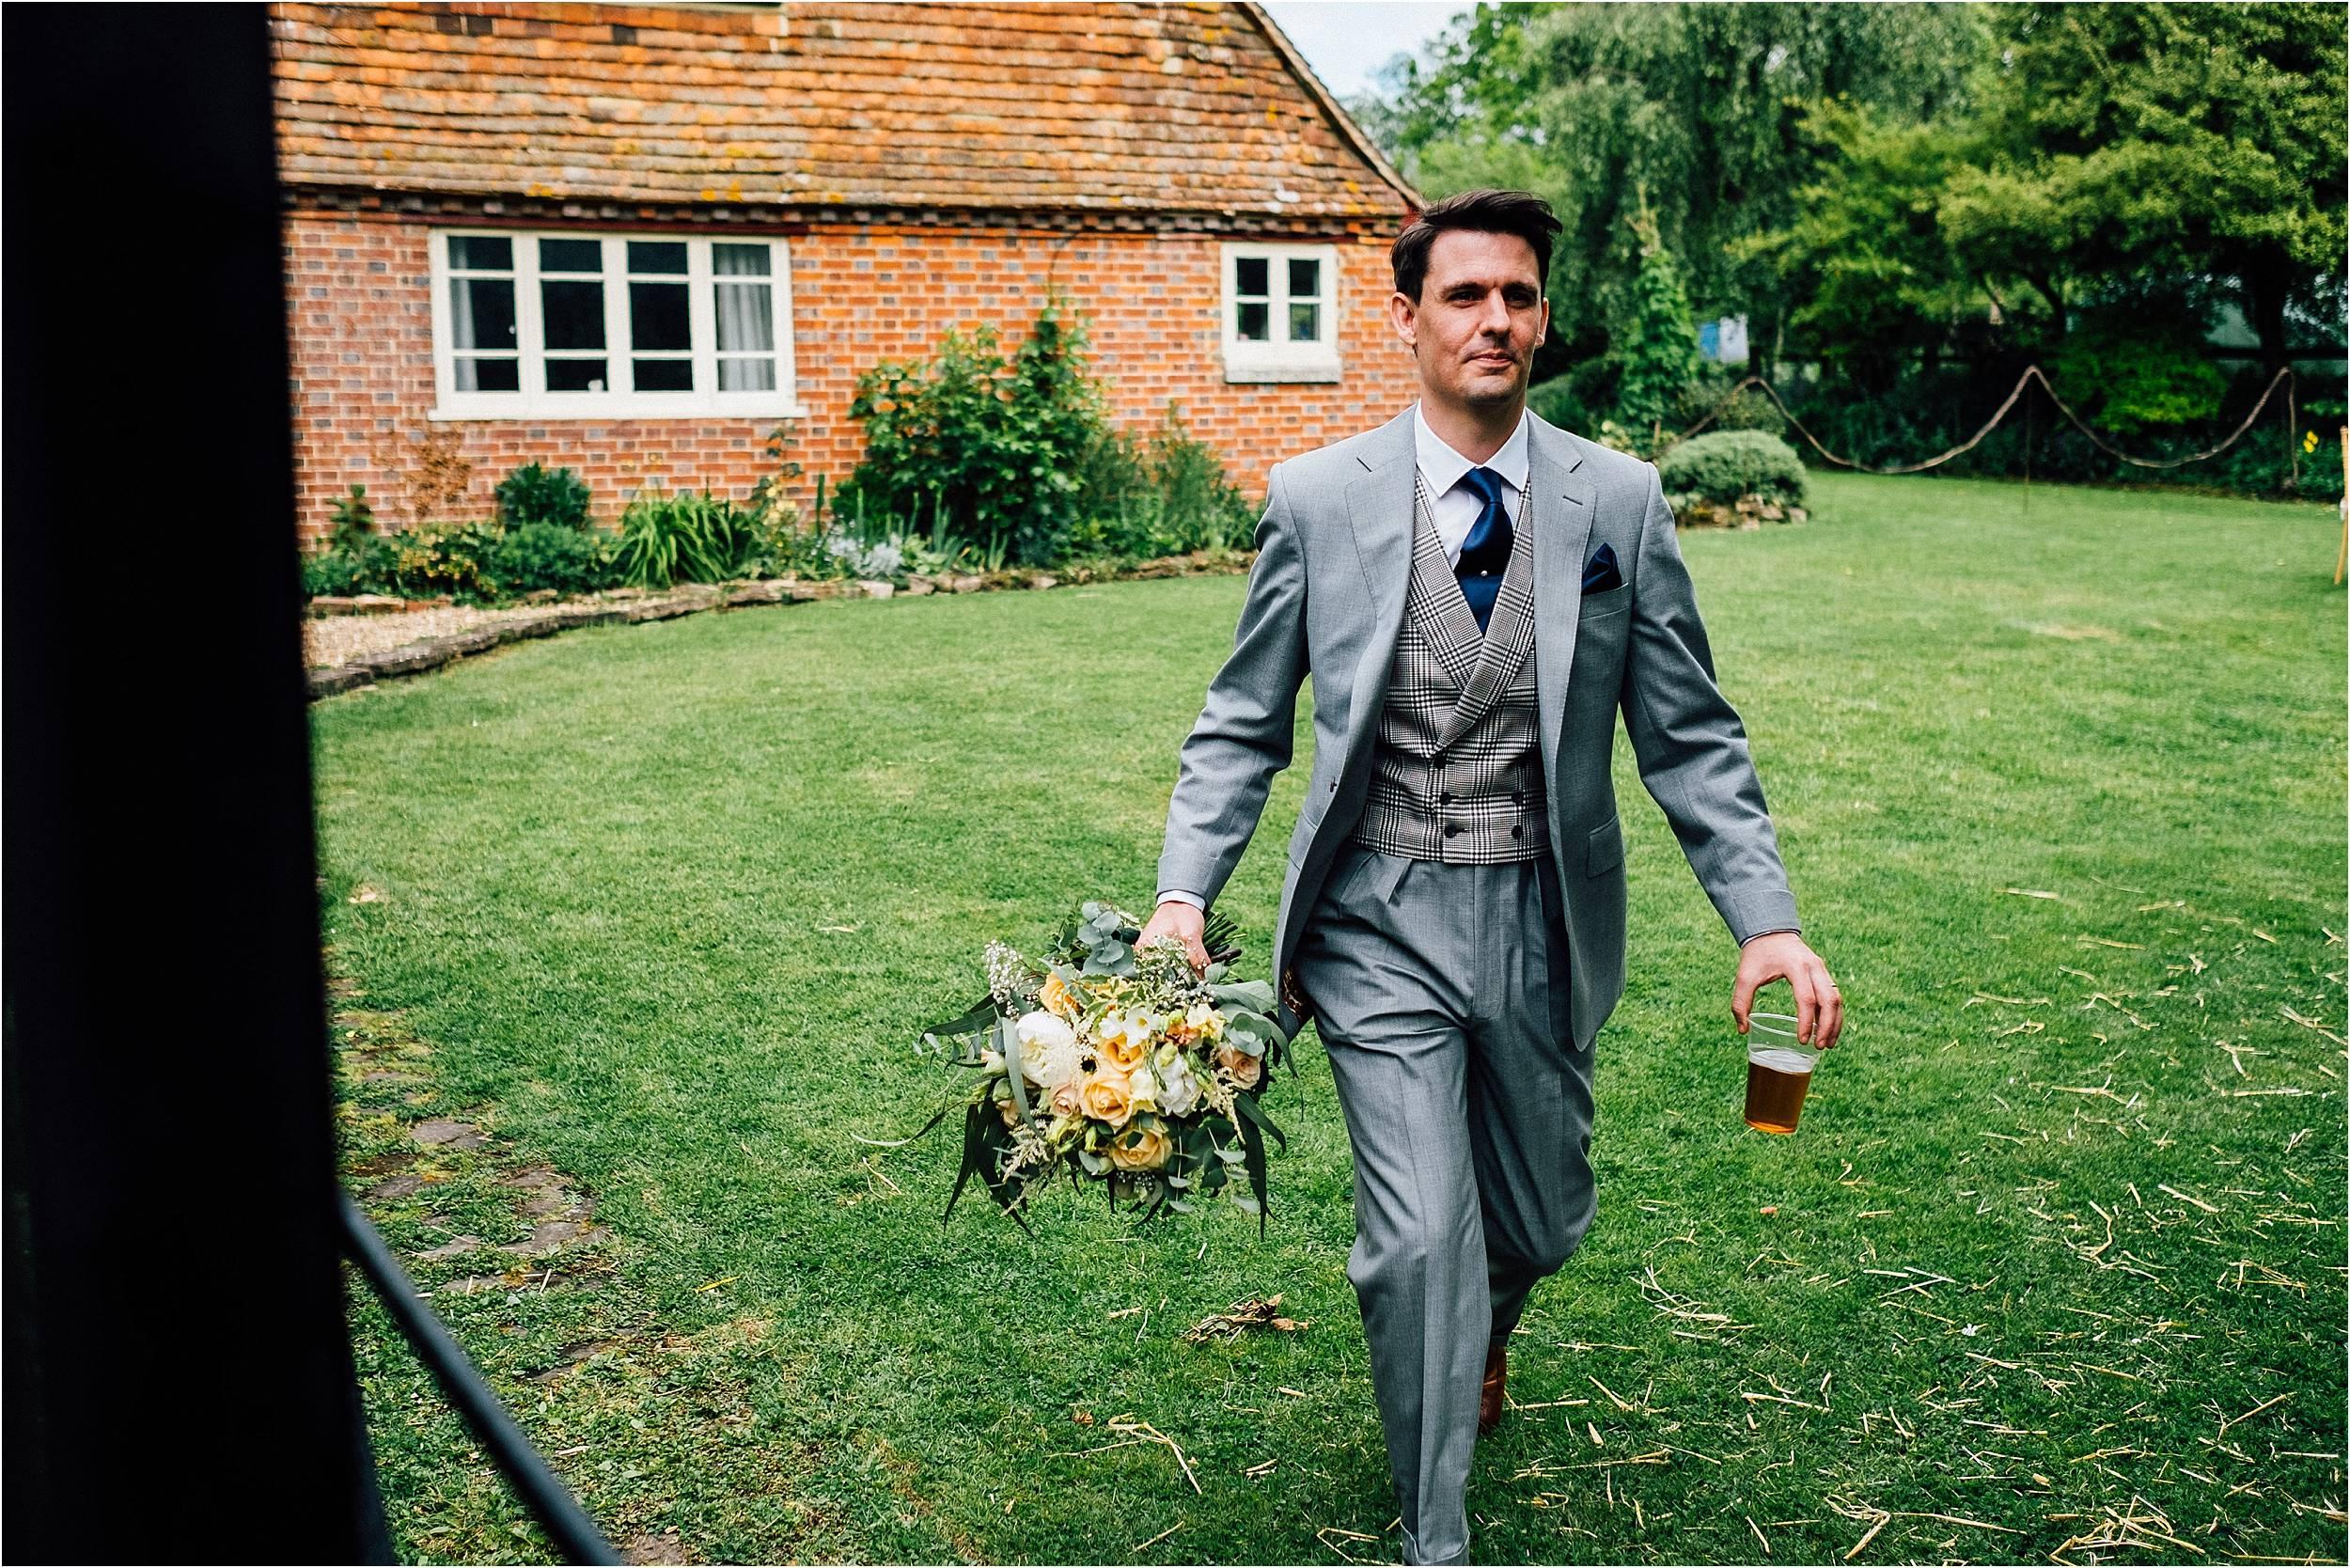 Surrey Hookhouse Farm Wedding Photographer_0113.jpg